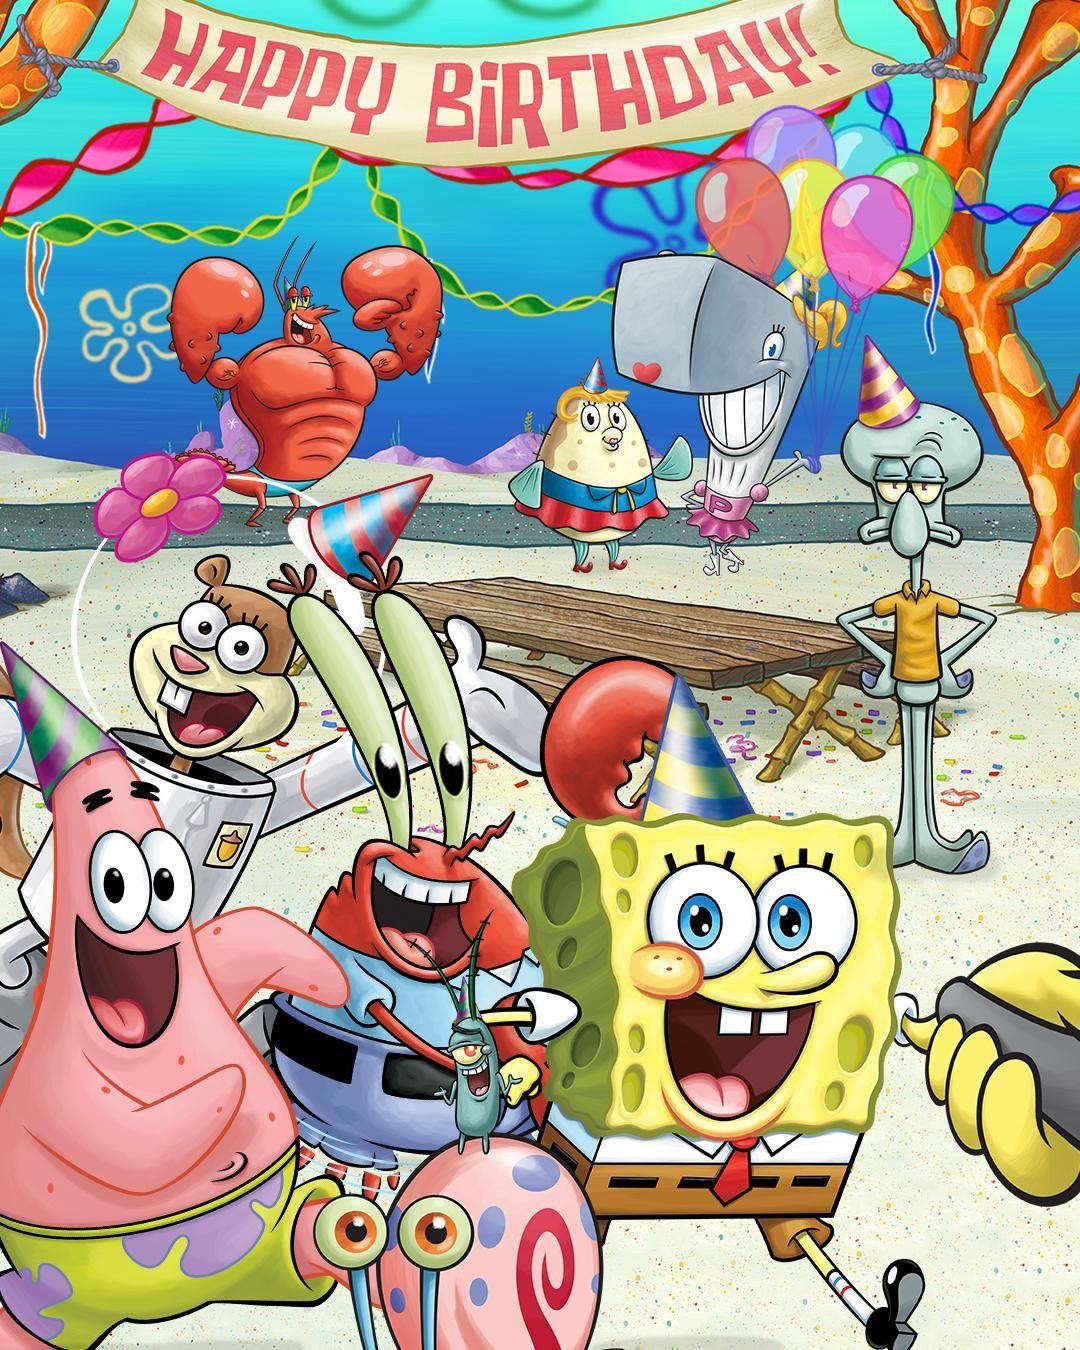 Spongebob SquarePants 20th Anniversary!